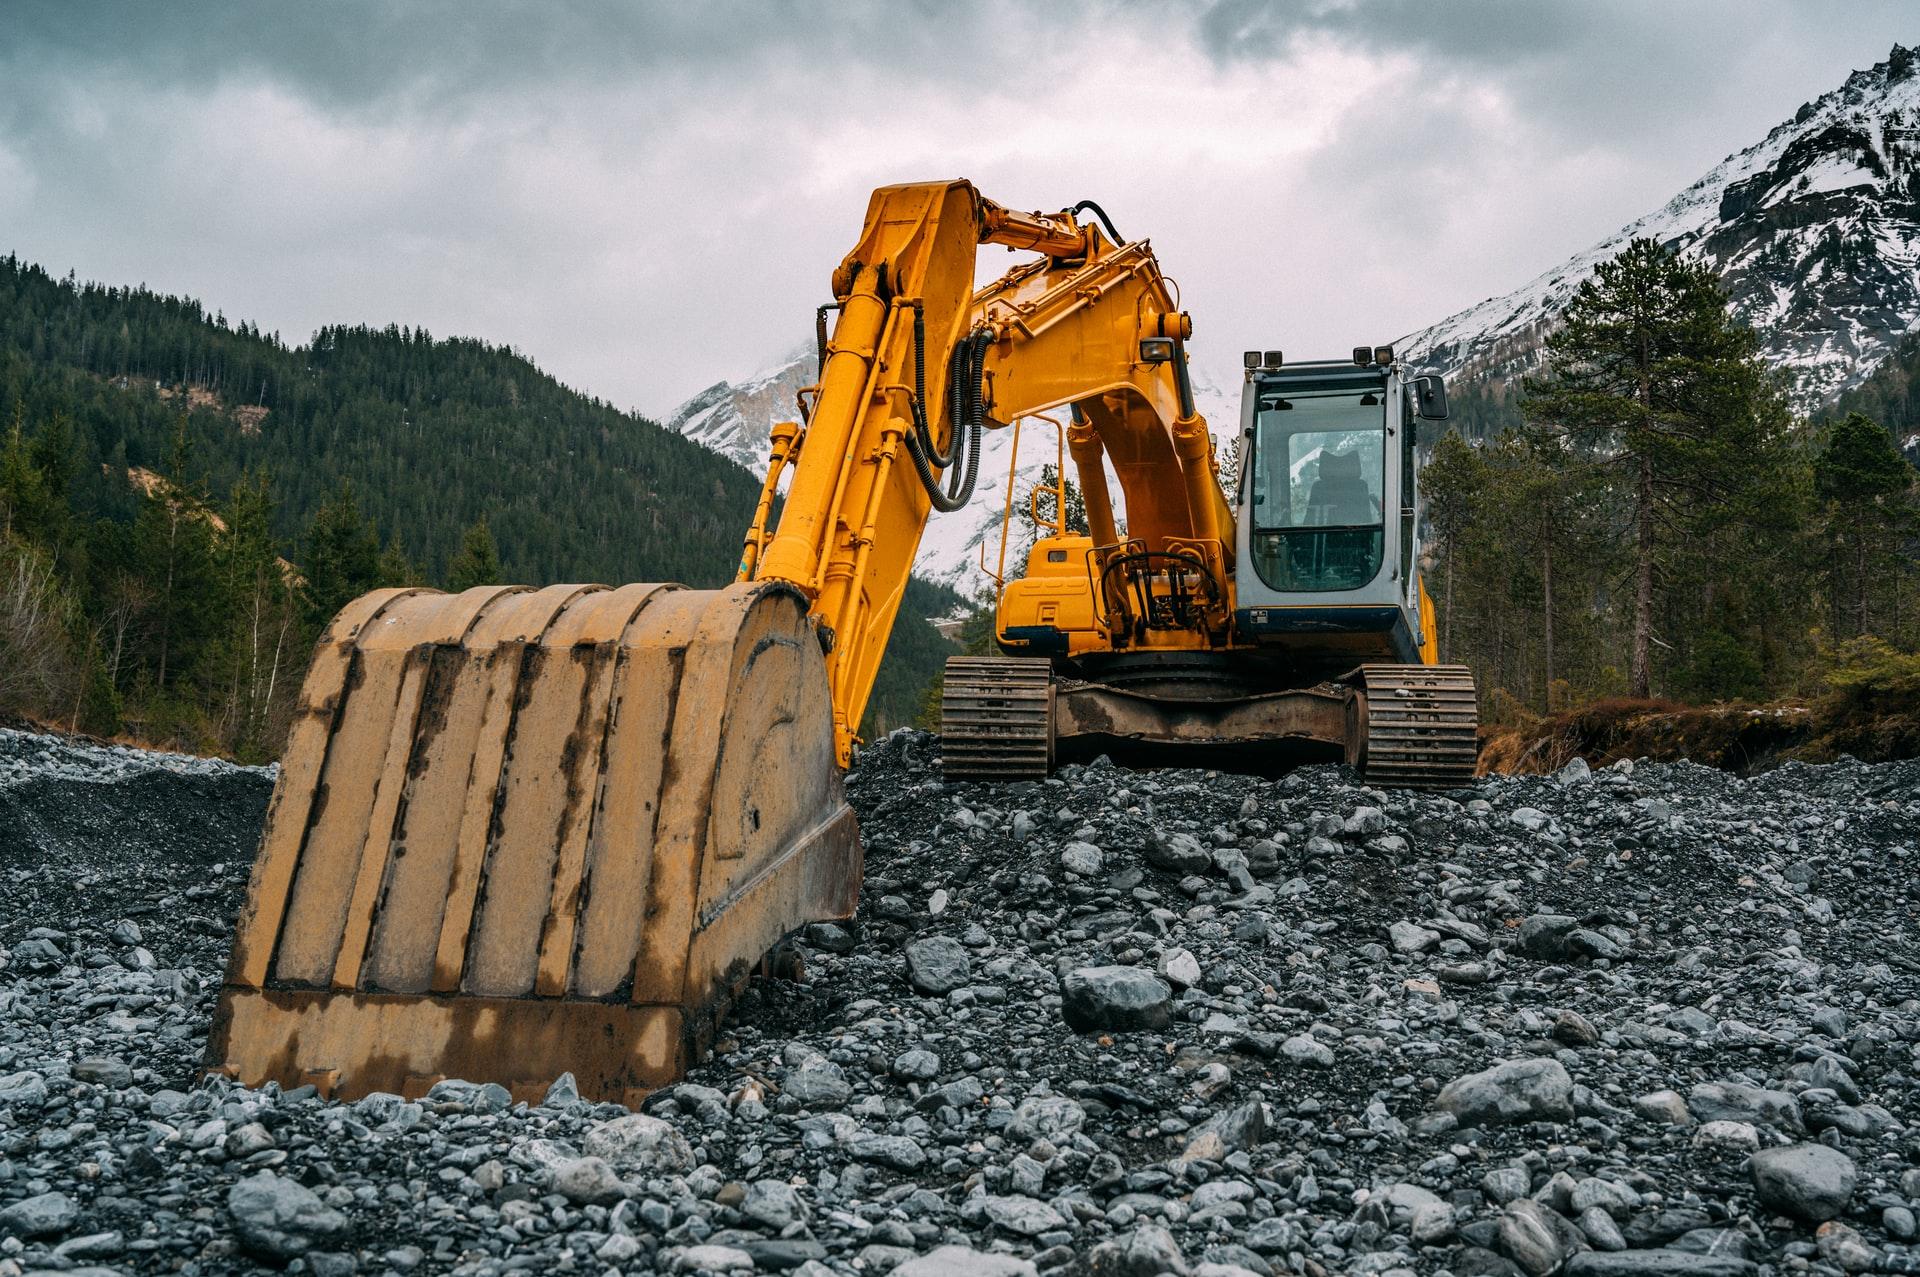 Shovels greater than bulldozers blog - Level AI